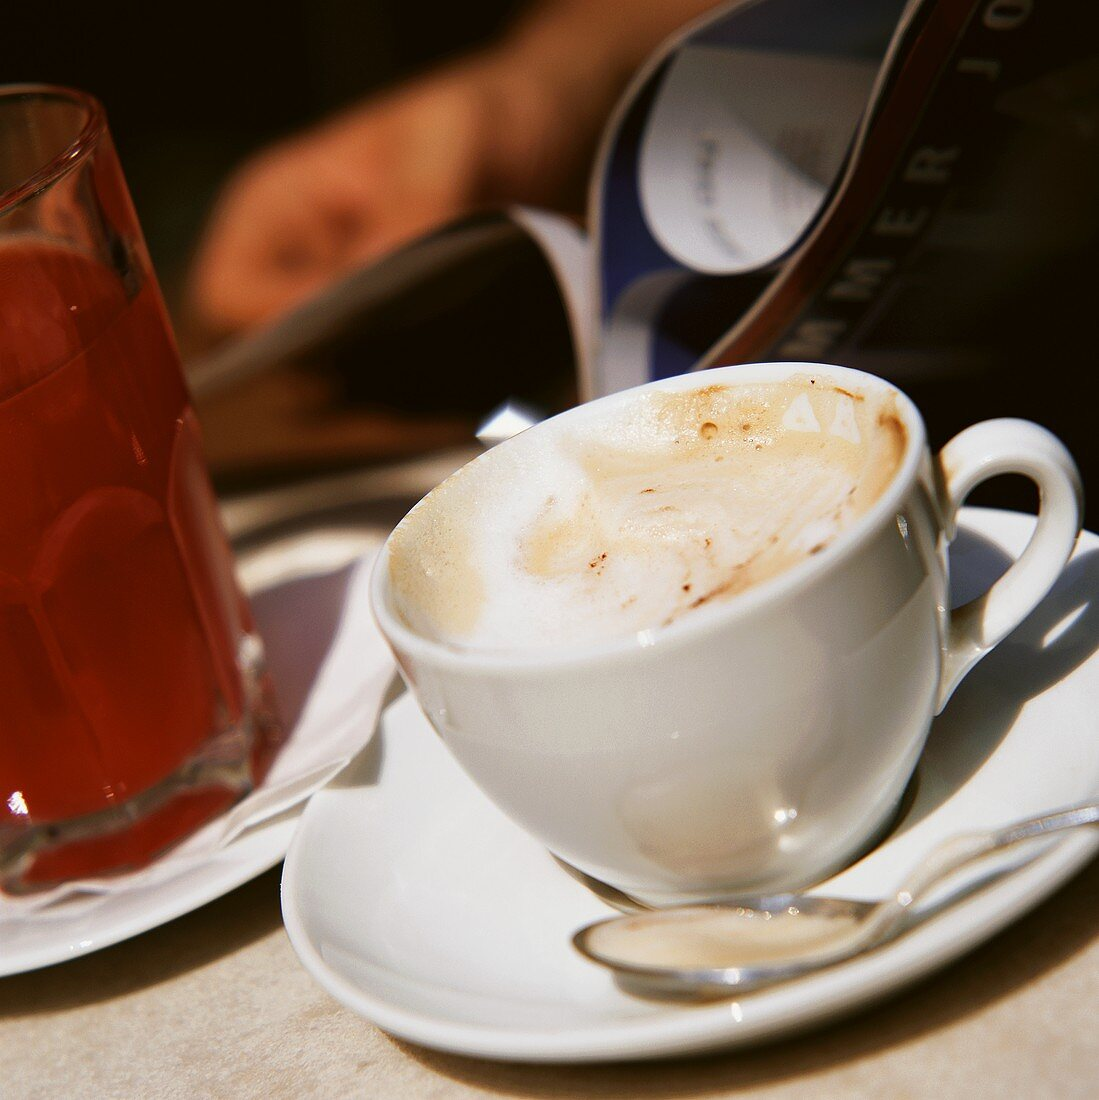 Cappuccino and orange juice